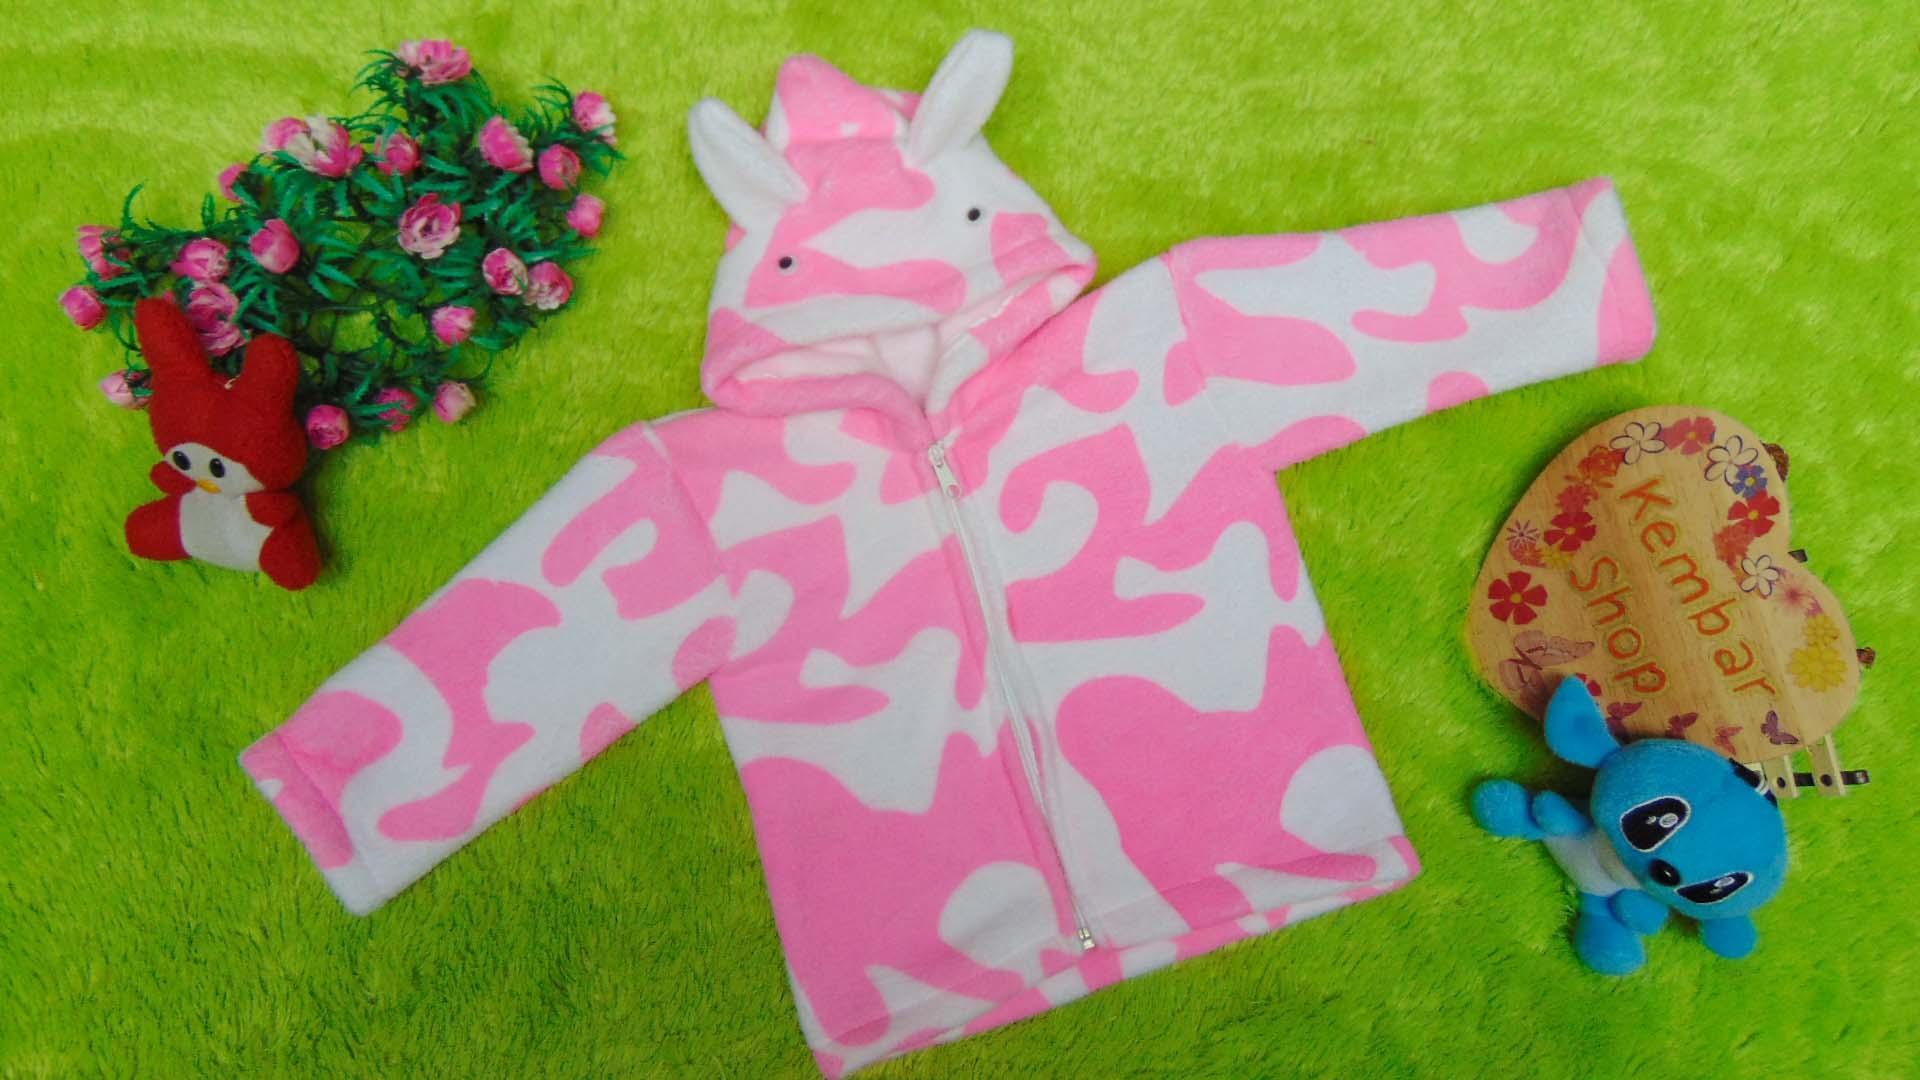 kembarshop - Baju Jaket Bayi Newborn 0-12bulan Doreng Mantel Hangat Murah